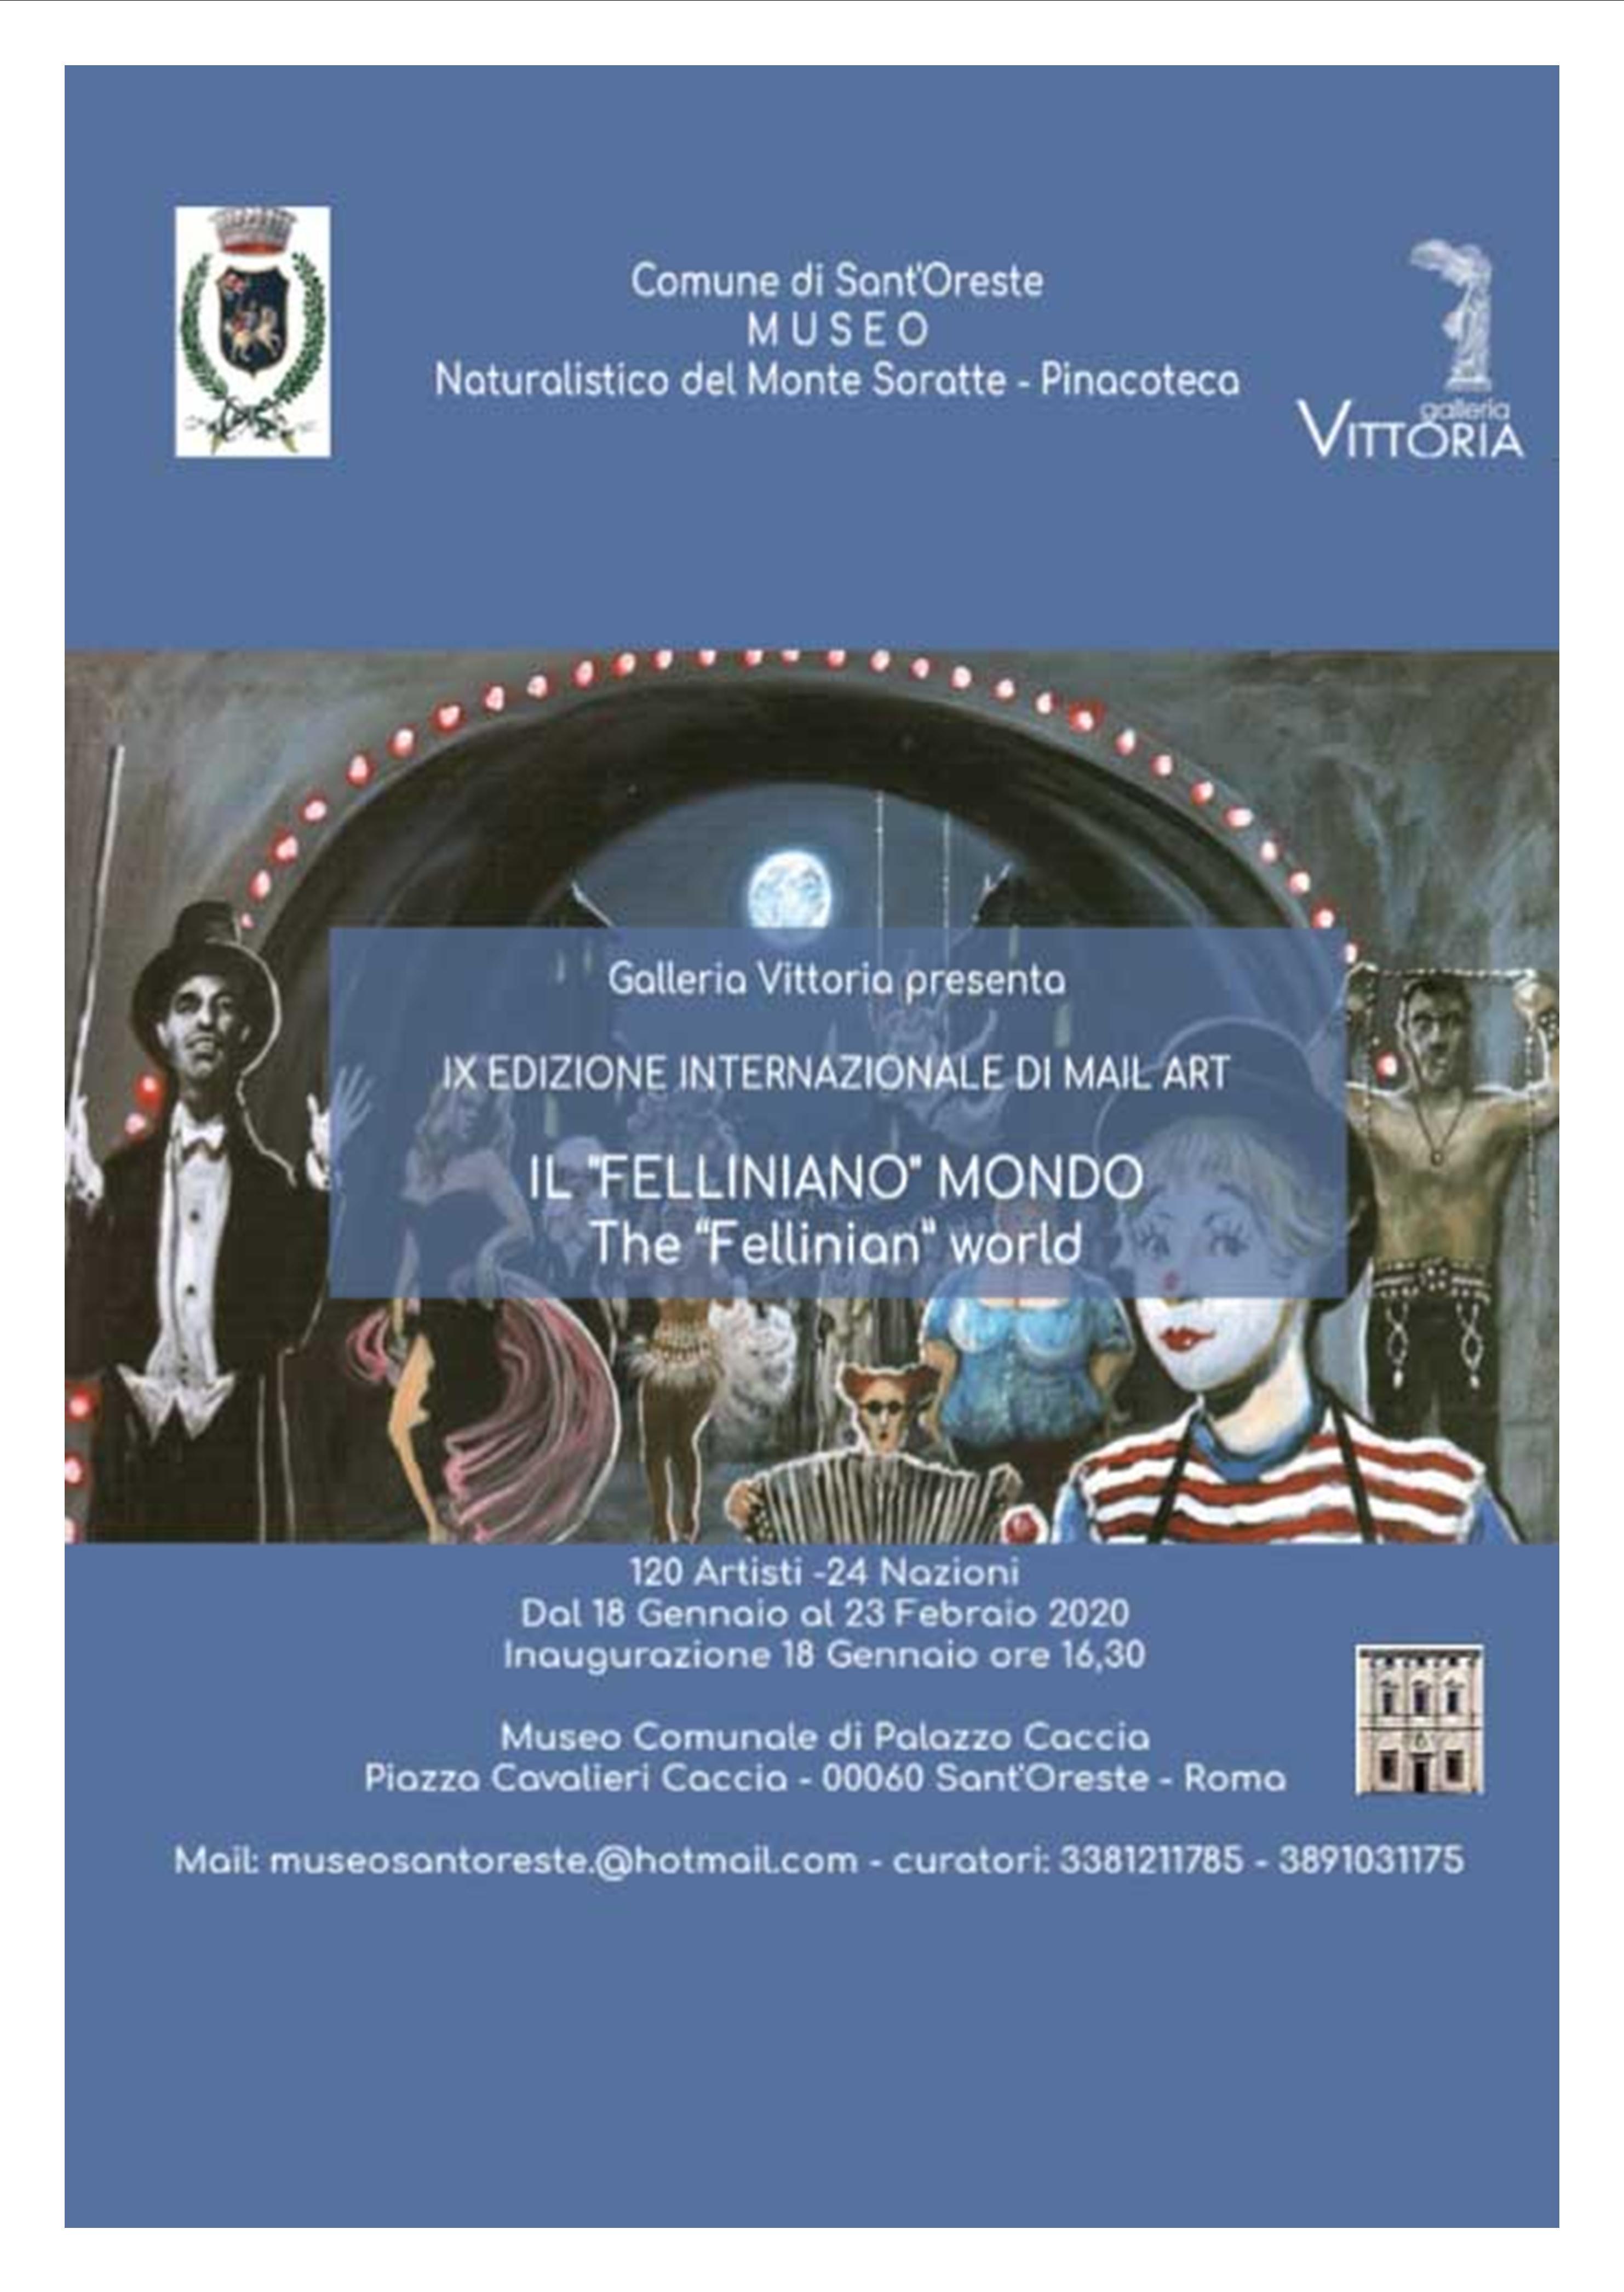 Mostra a ROMA dedicata a FEDERICO FELLINI 2020